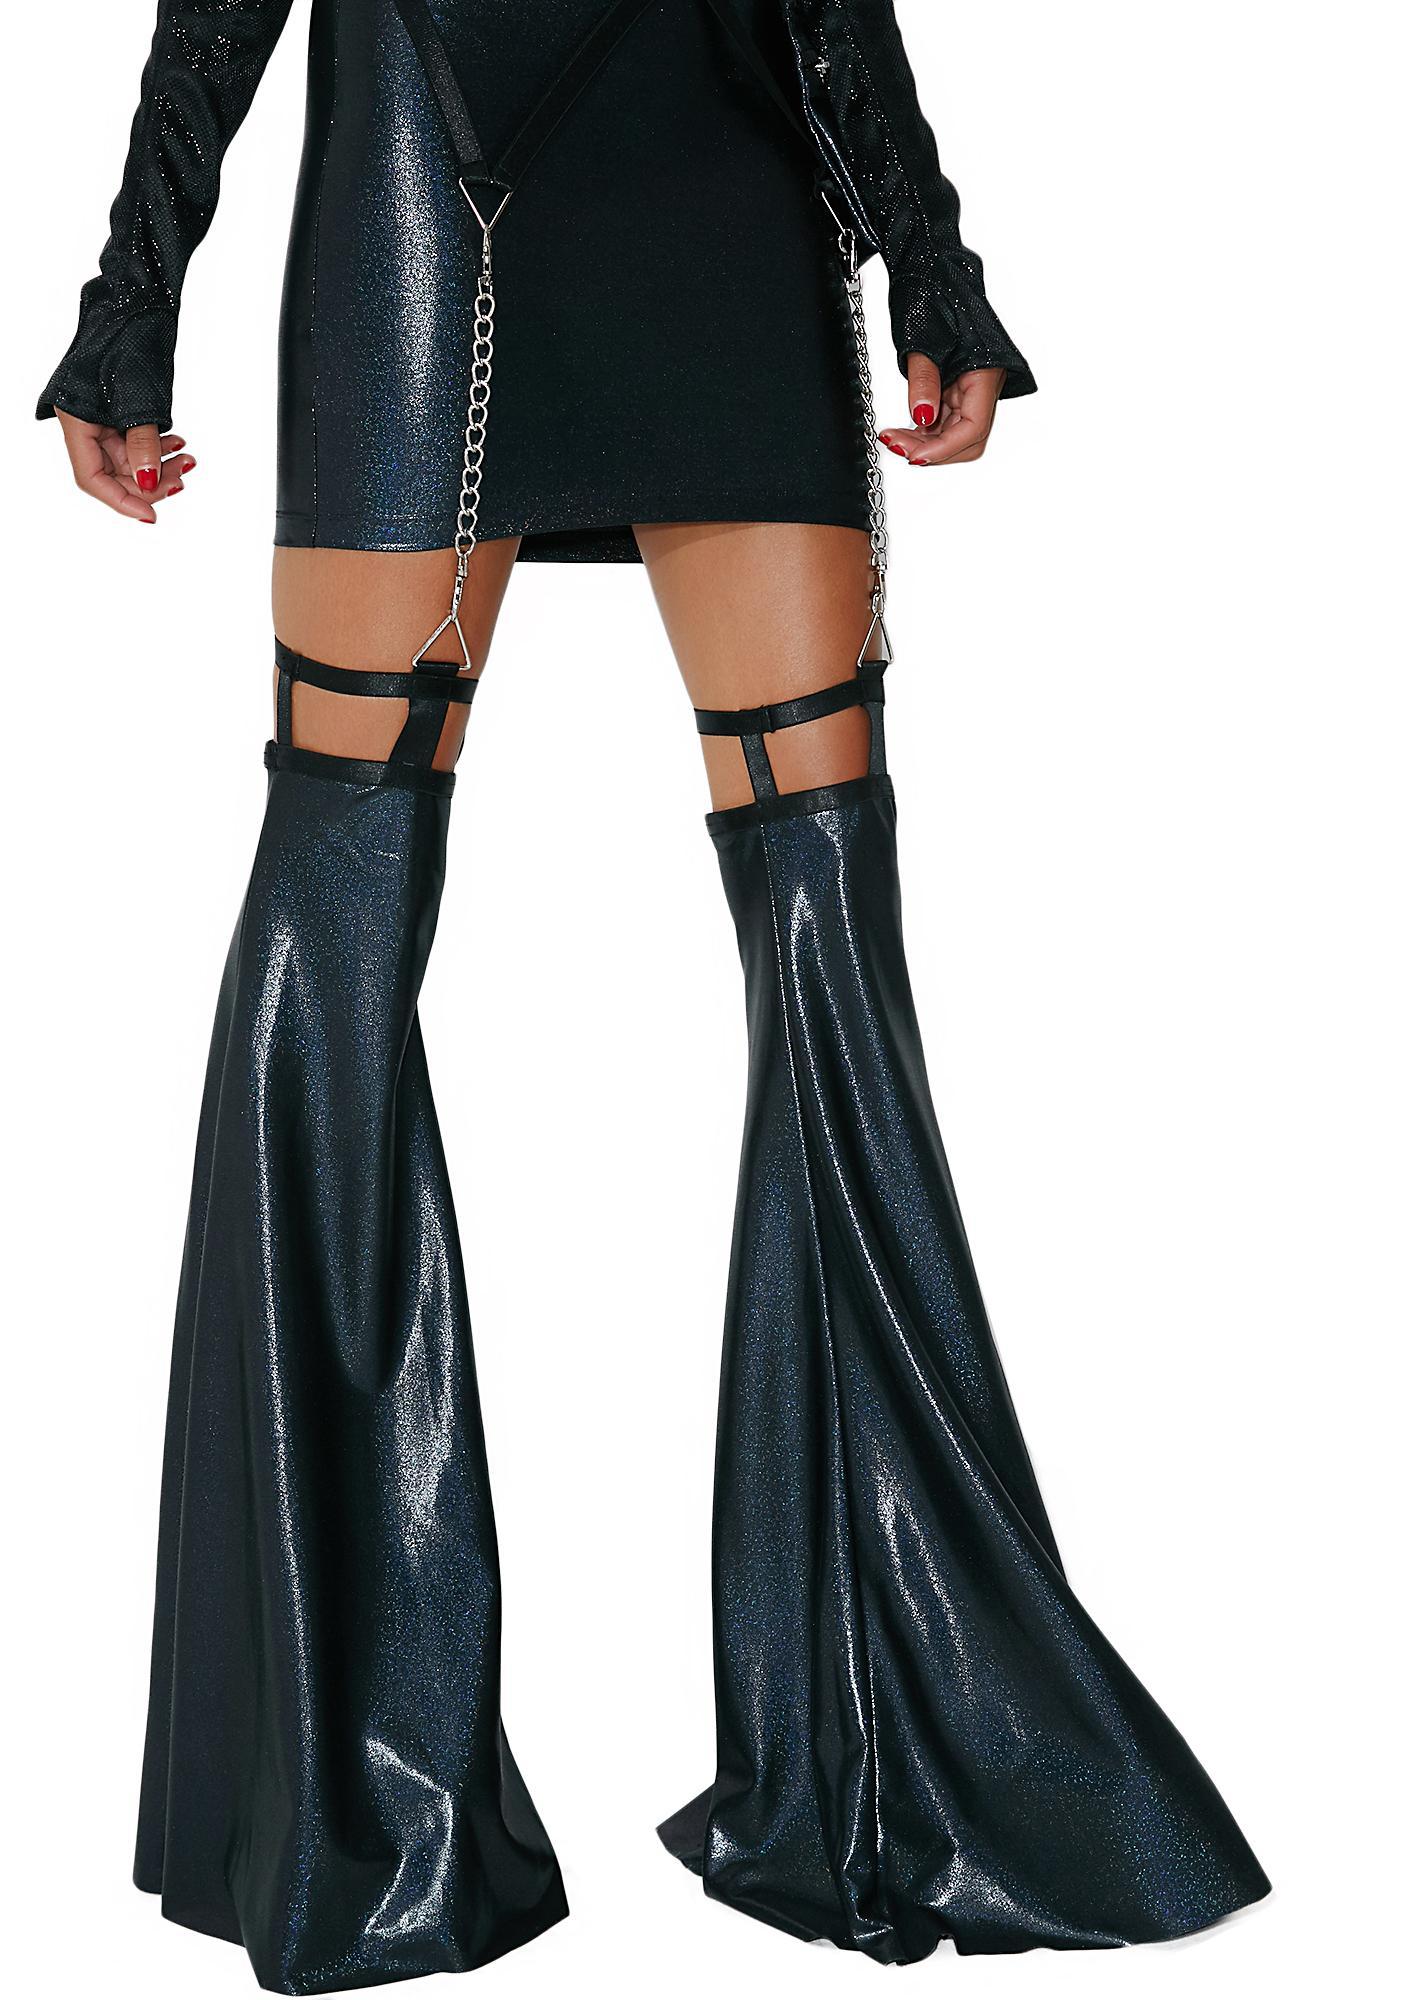 Club Exx Shadow Trance Mini Garter Skirt